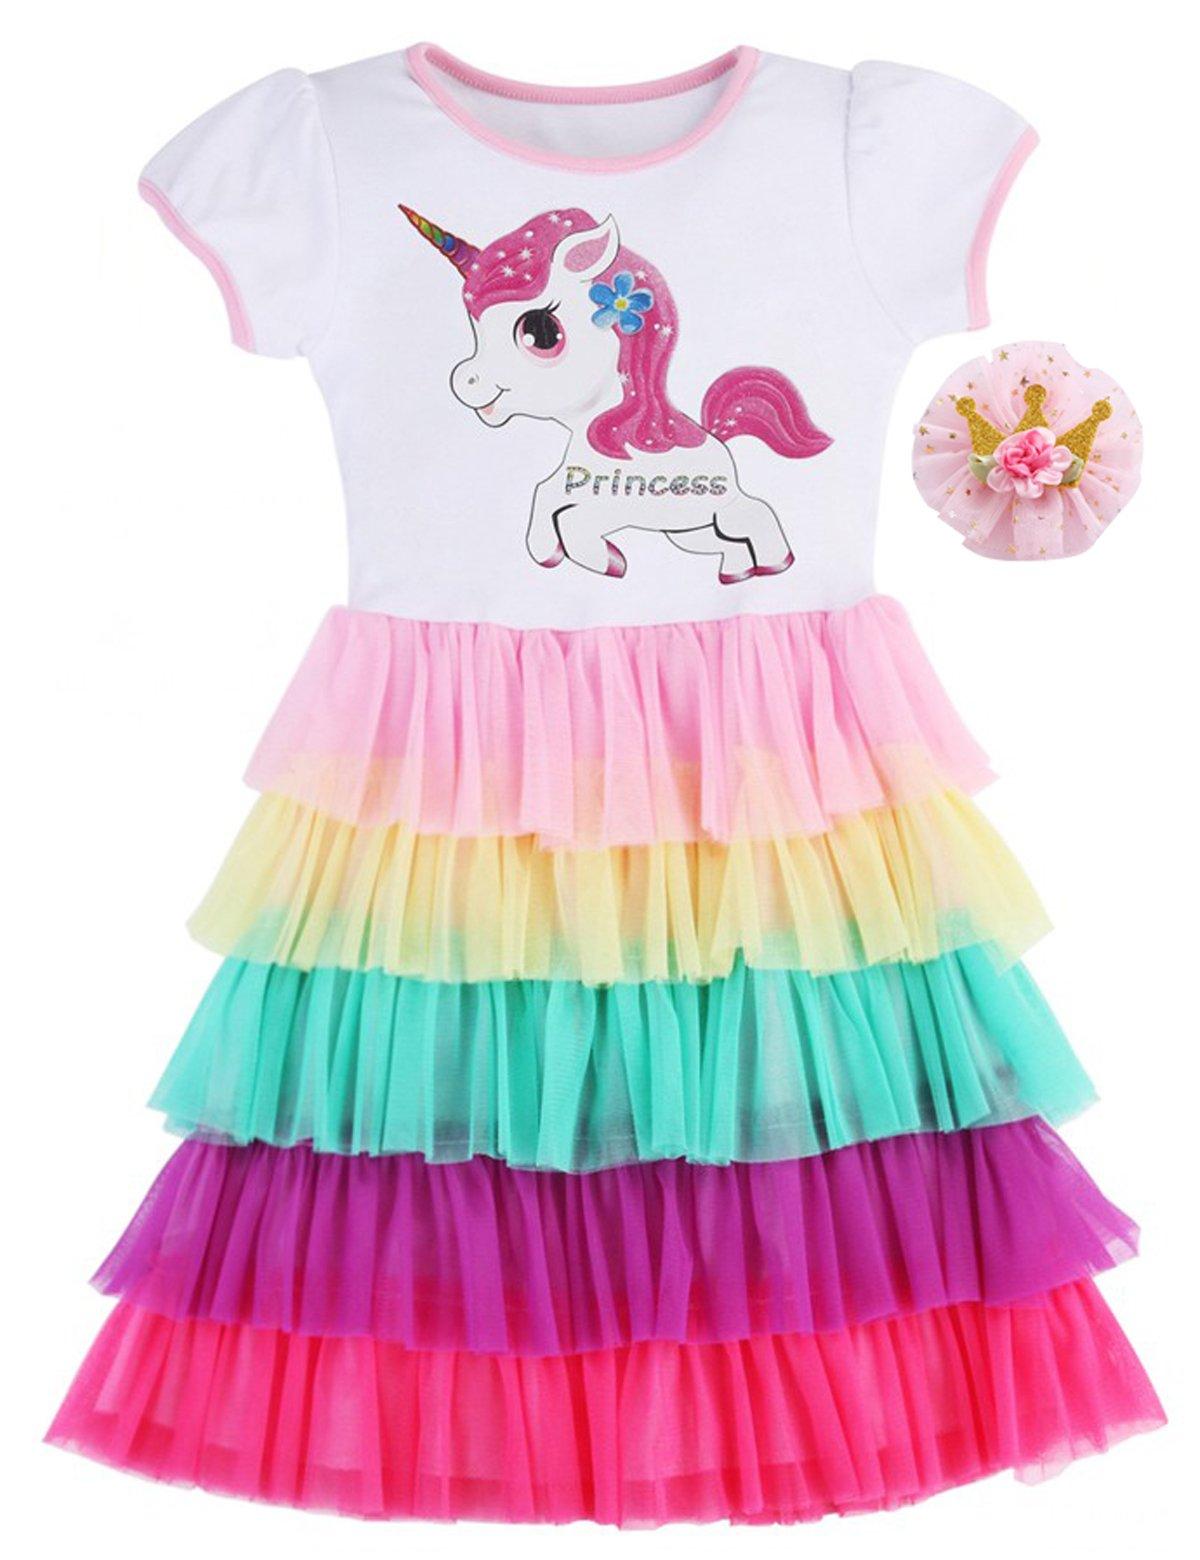 Fubin Girls Unicorn Tutu Dress Summer Clothes,Princess Crown,3-4 Years(Size 110)